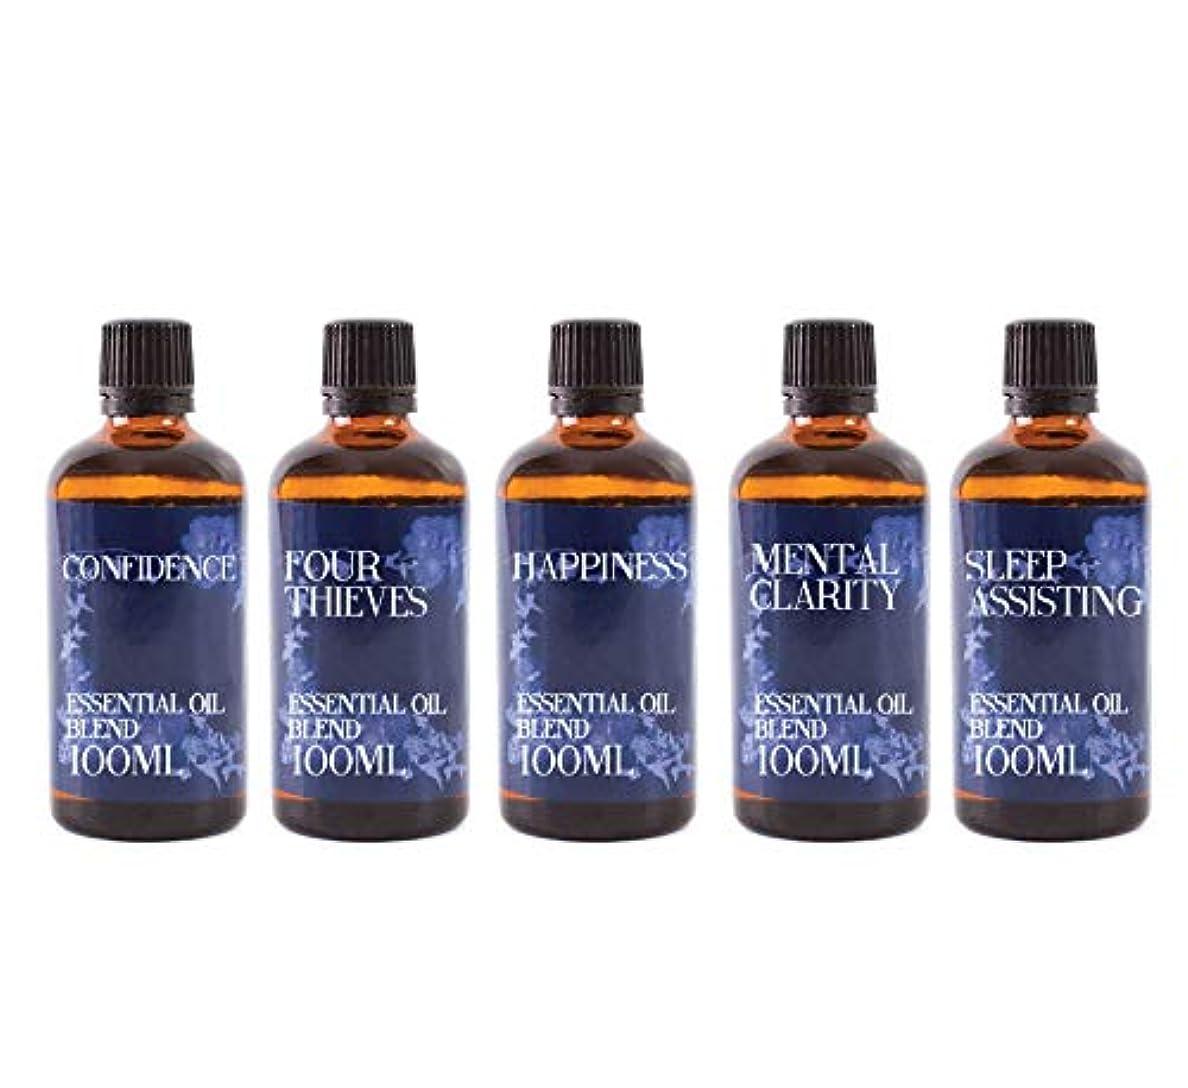 Mystix London   Gift Starter Pack of 5 x 100ml - Everyday Essentials - Essential Oil Blends